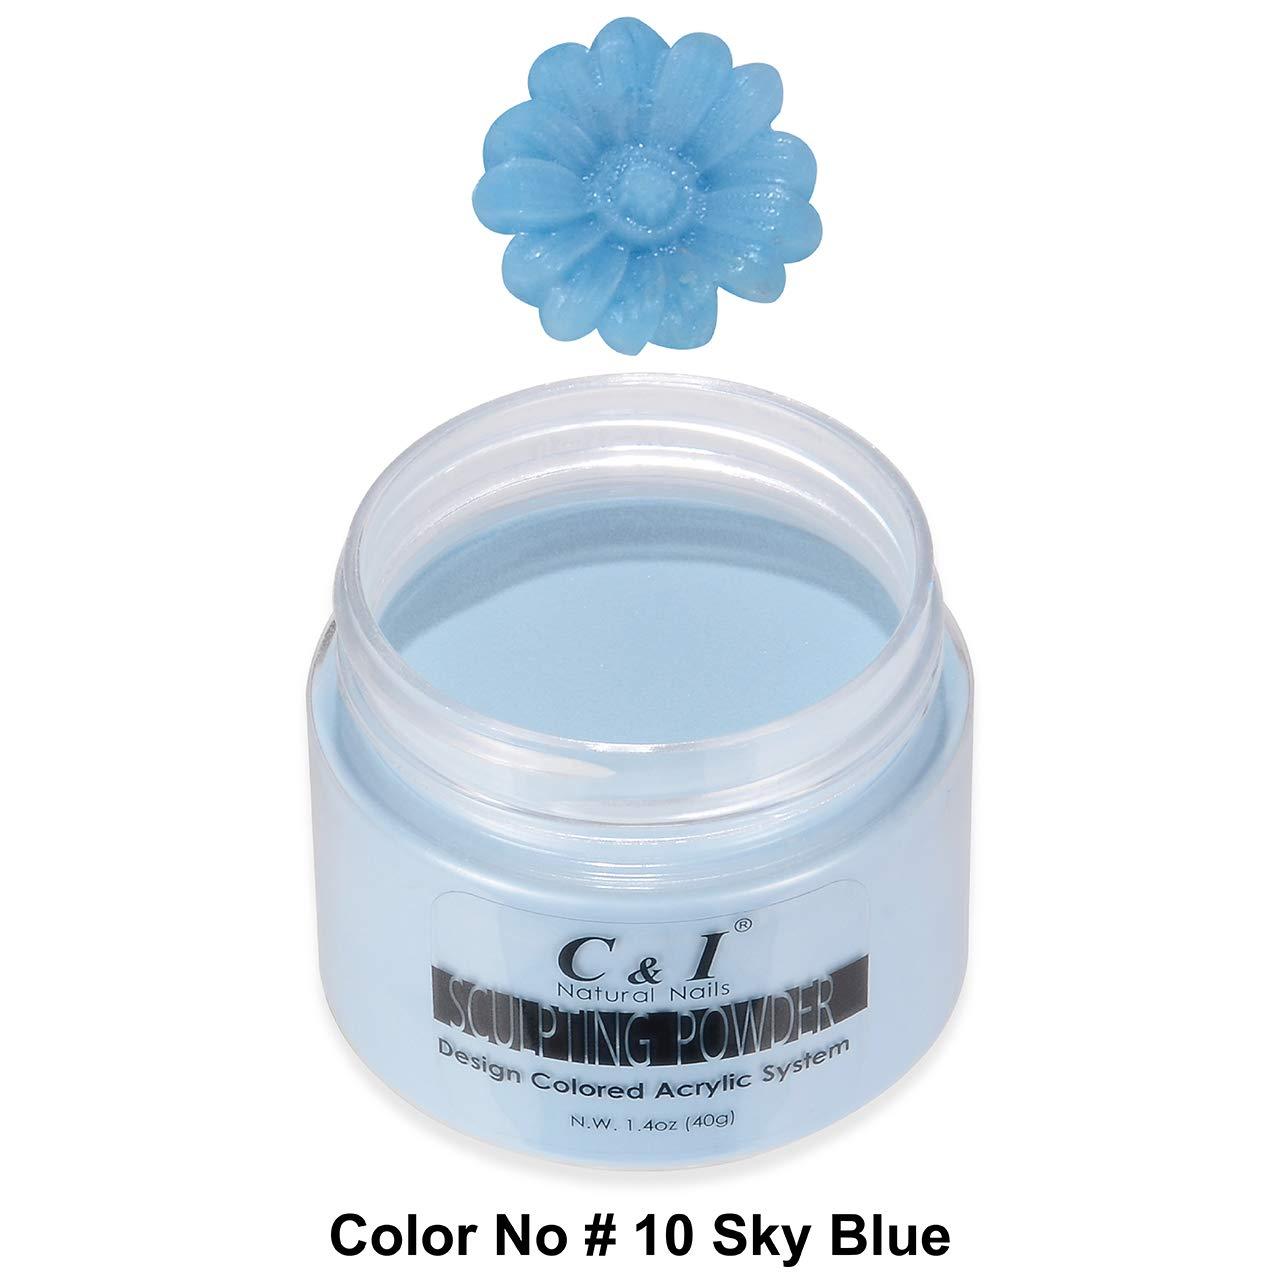 C&I Acrylic Powder, 10 Sky Blue, 3 D Nail Flower, Sculpting Nail Powder, 1.4 oz, 40 g